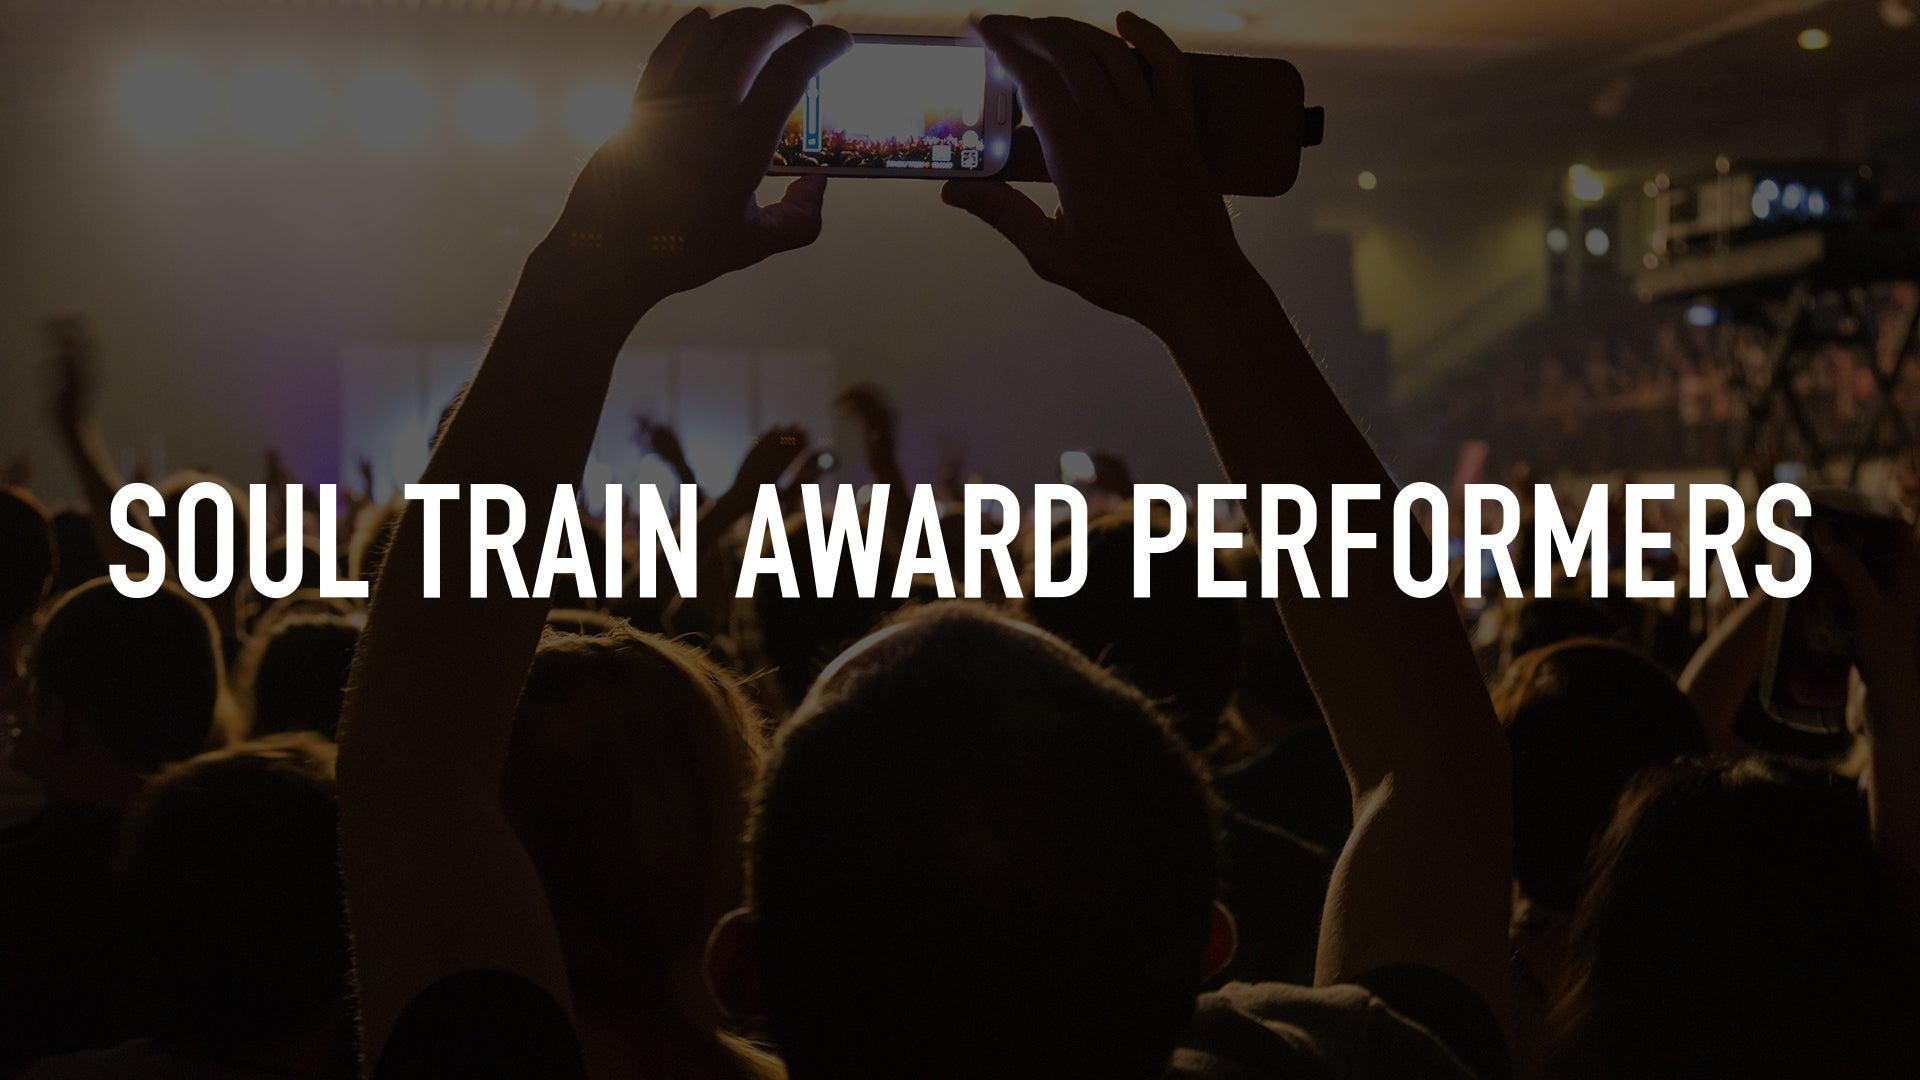 Soul Train Award Performers